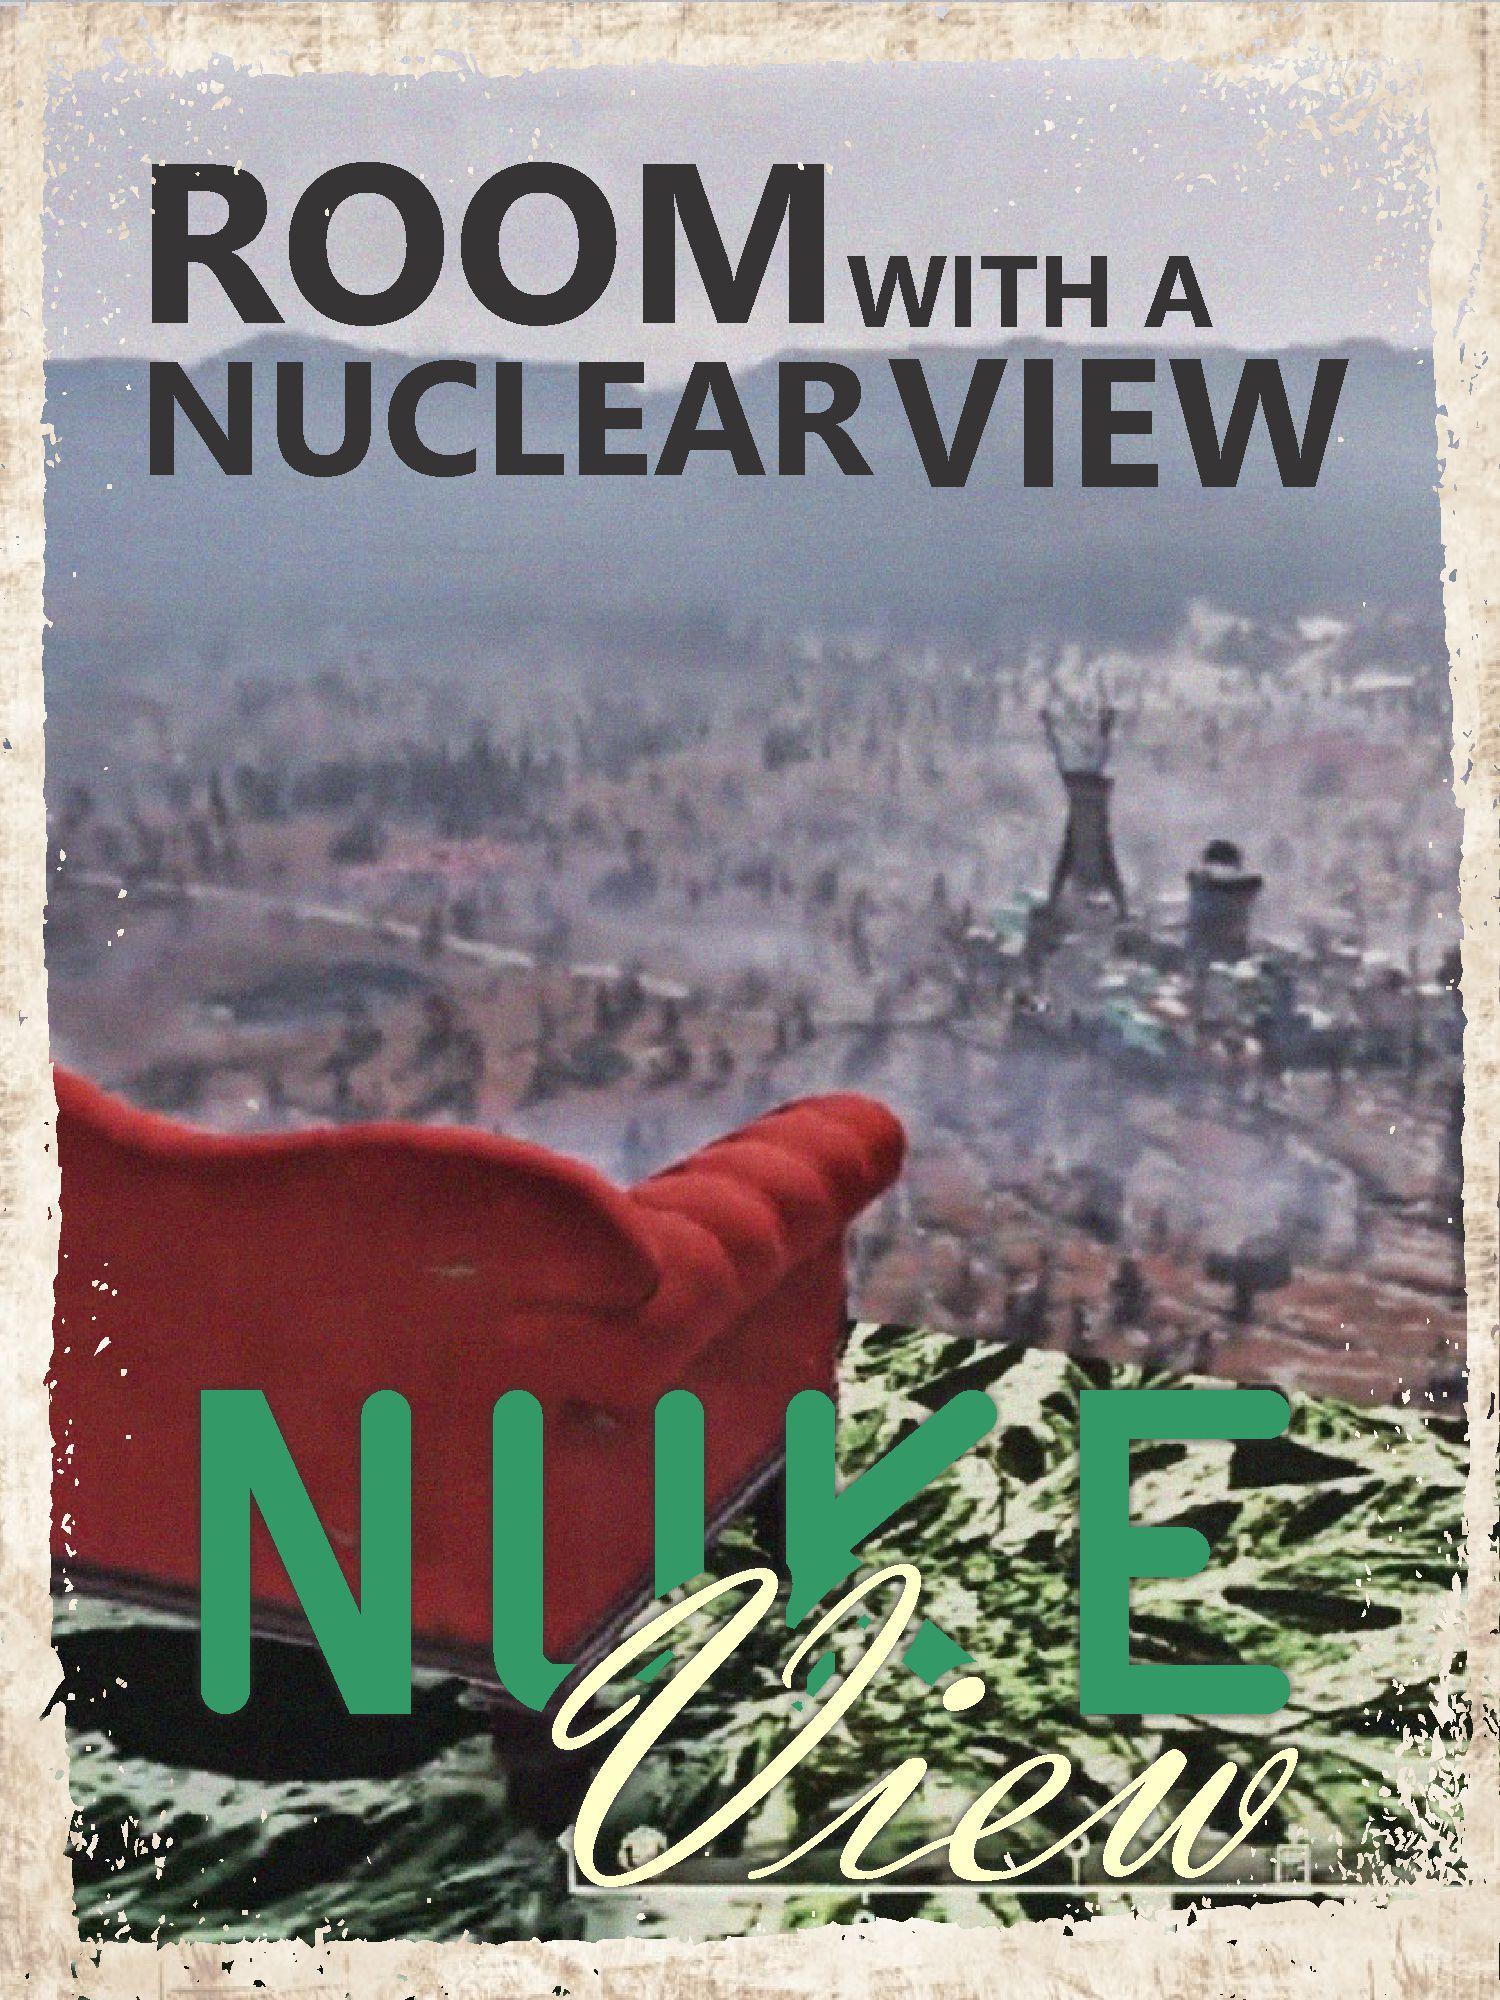 Nuke View